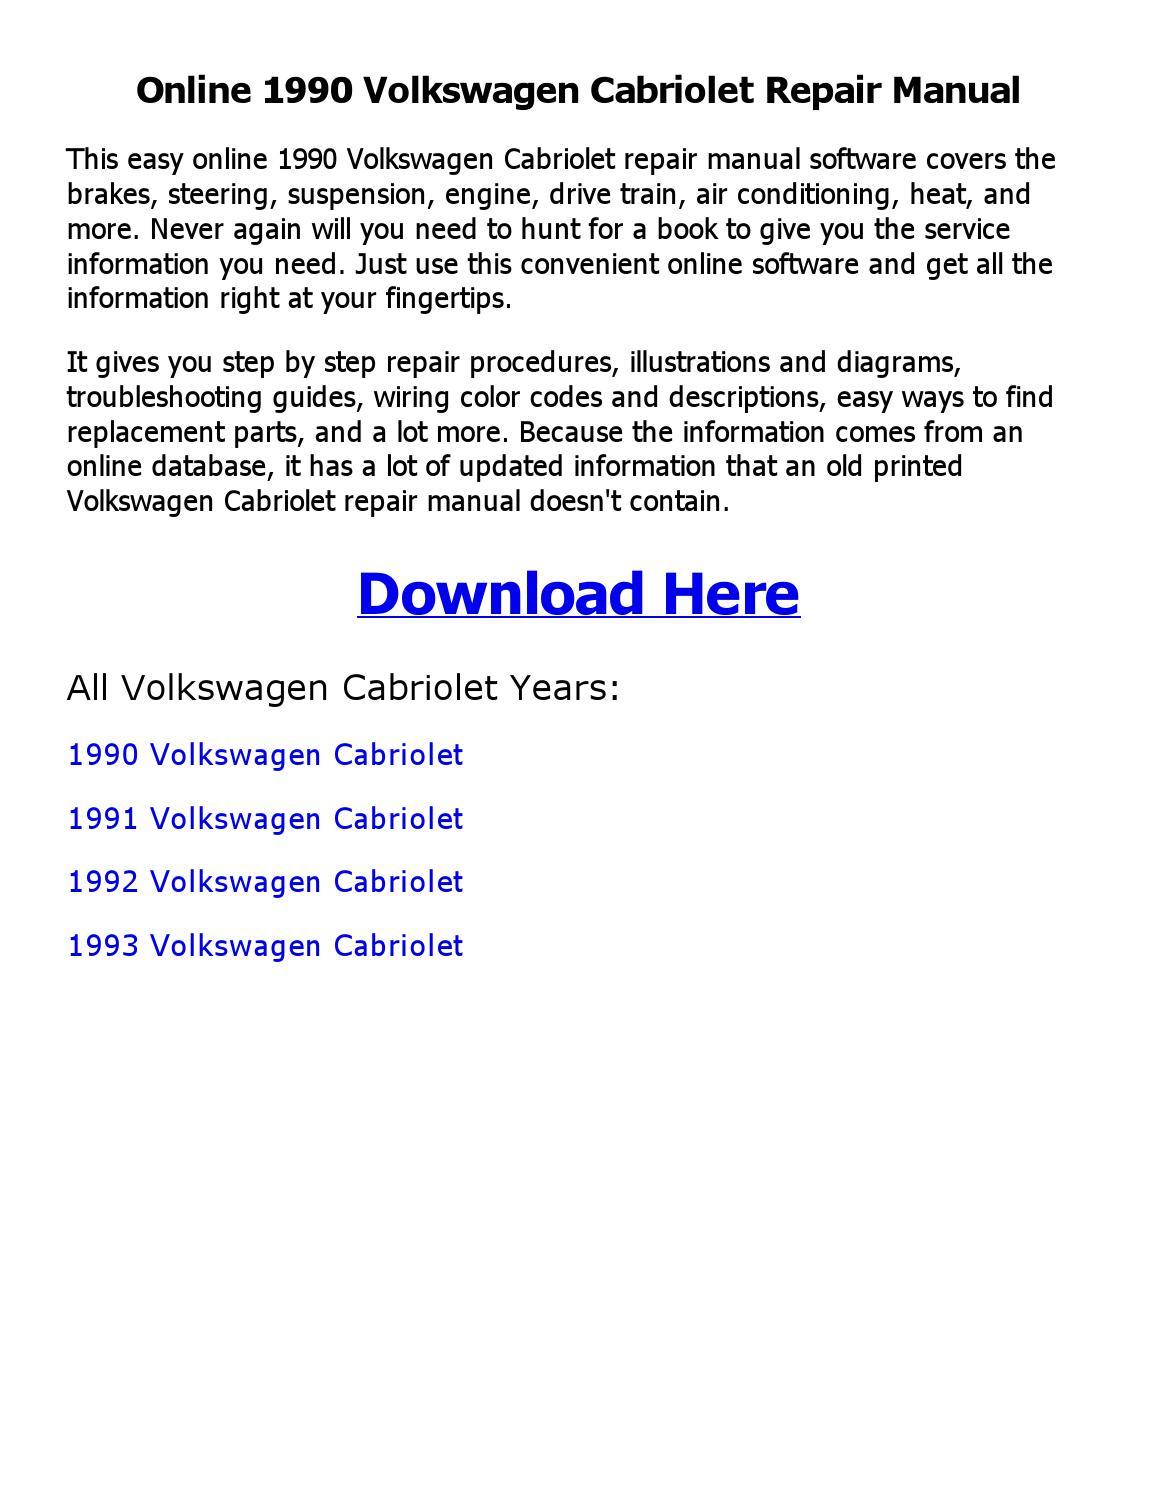 1992 vw cabriolet wiring diagram 1990 volkswagen cabriolet repair manual online by sayma issuu  1990 volkswagen cabriolet repair manual